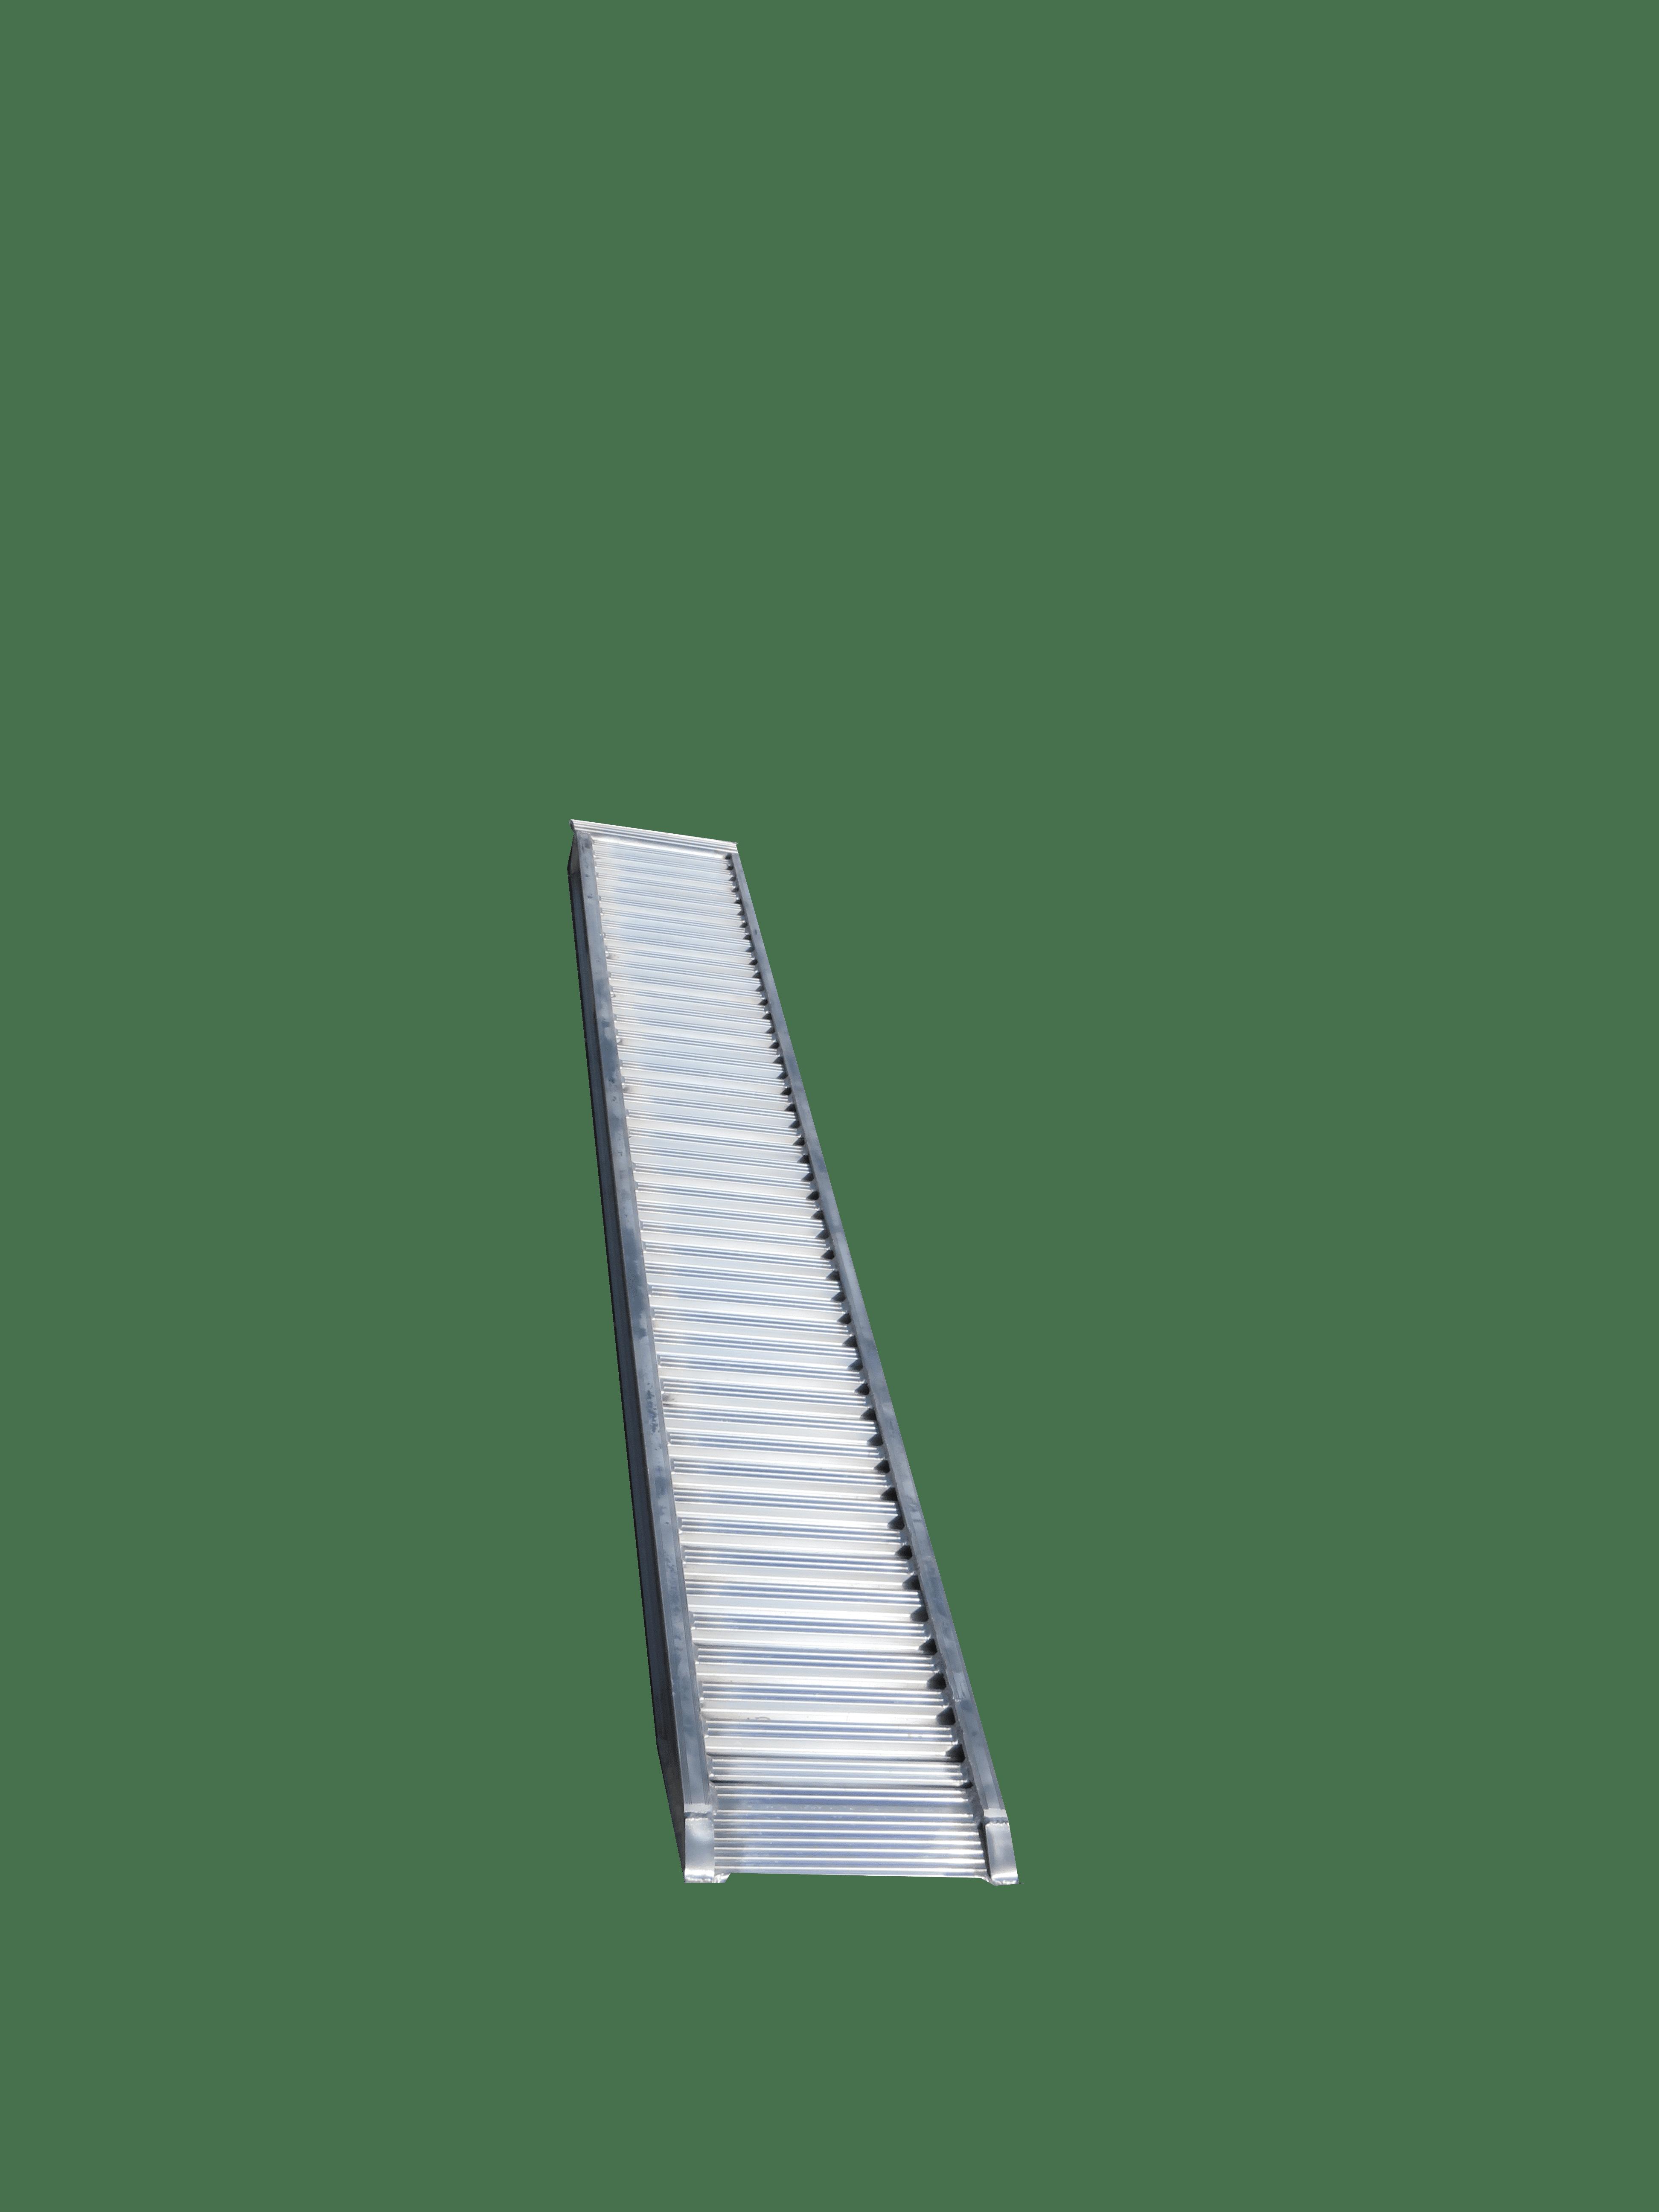 1 Stück ALU-Auffahrschiene